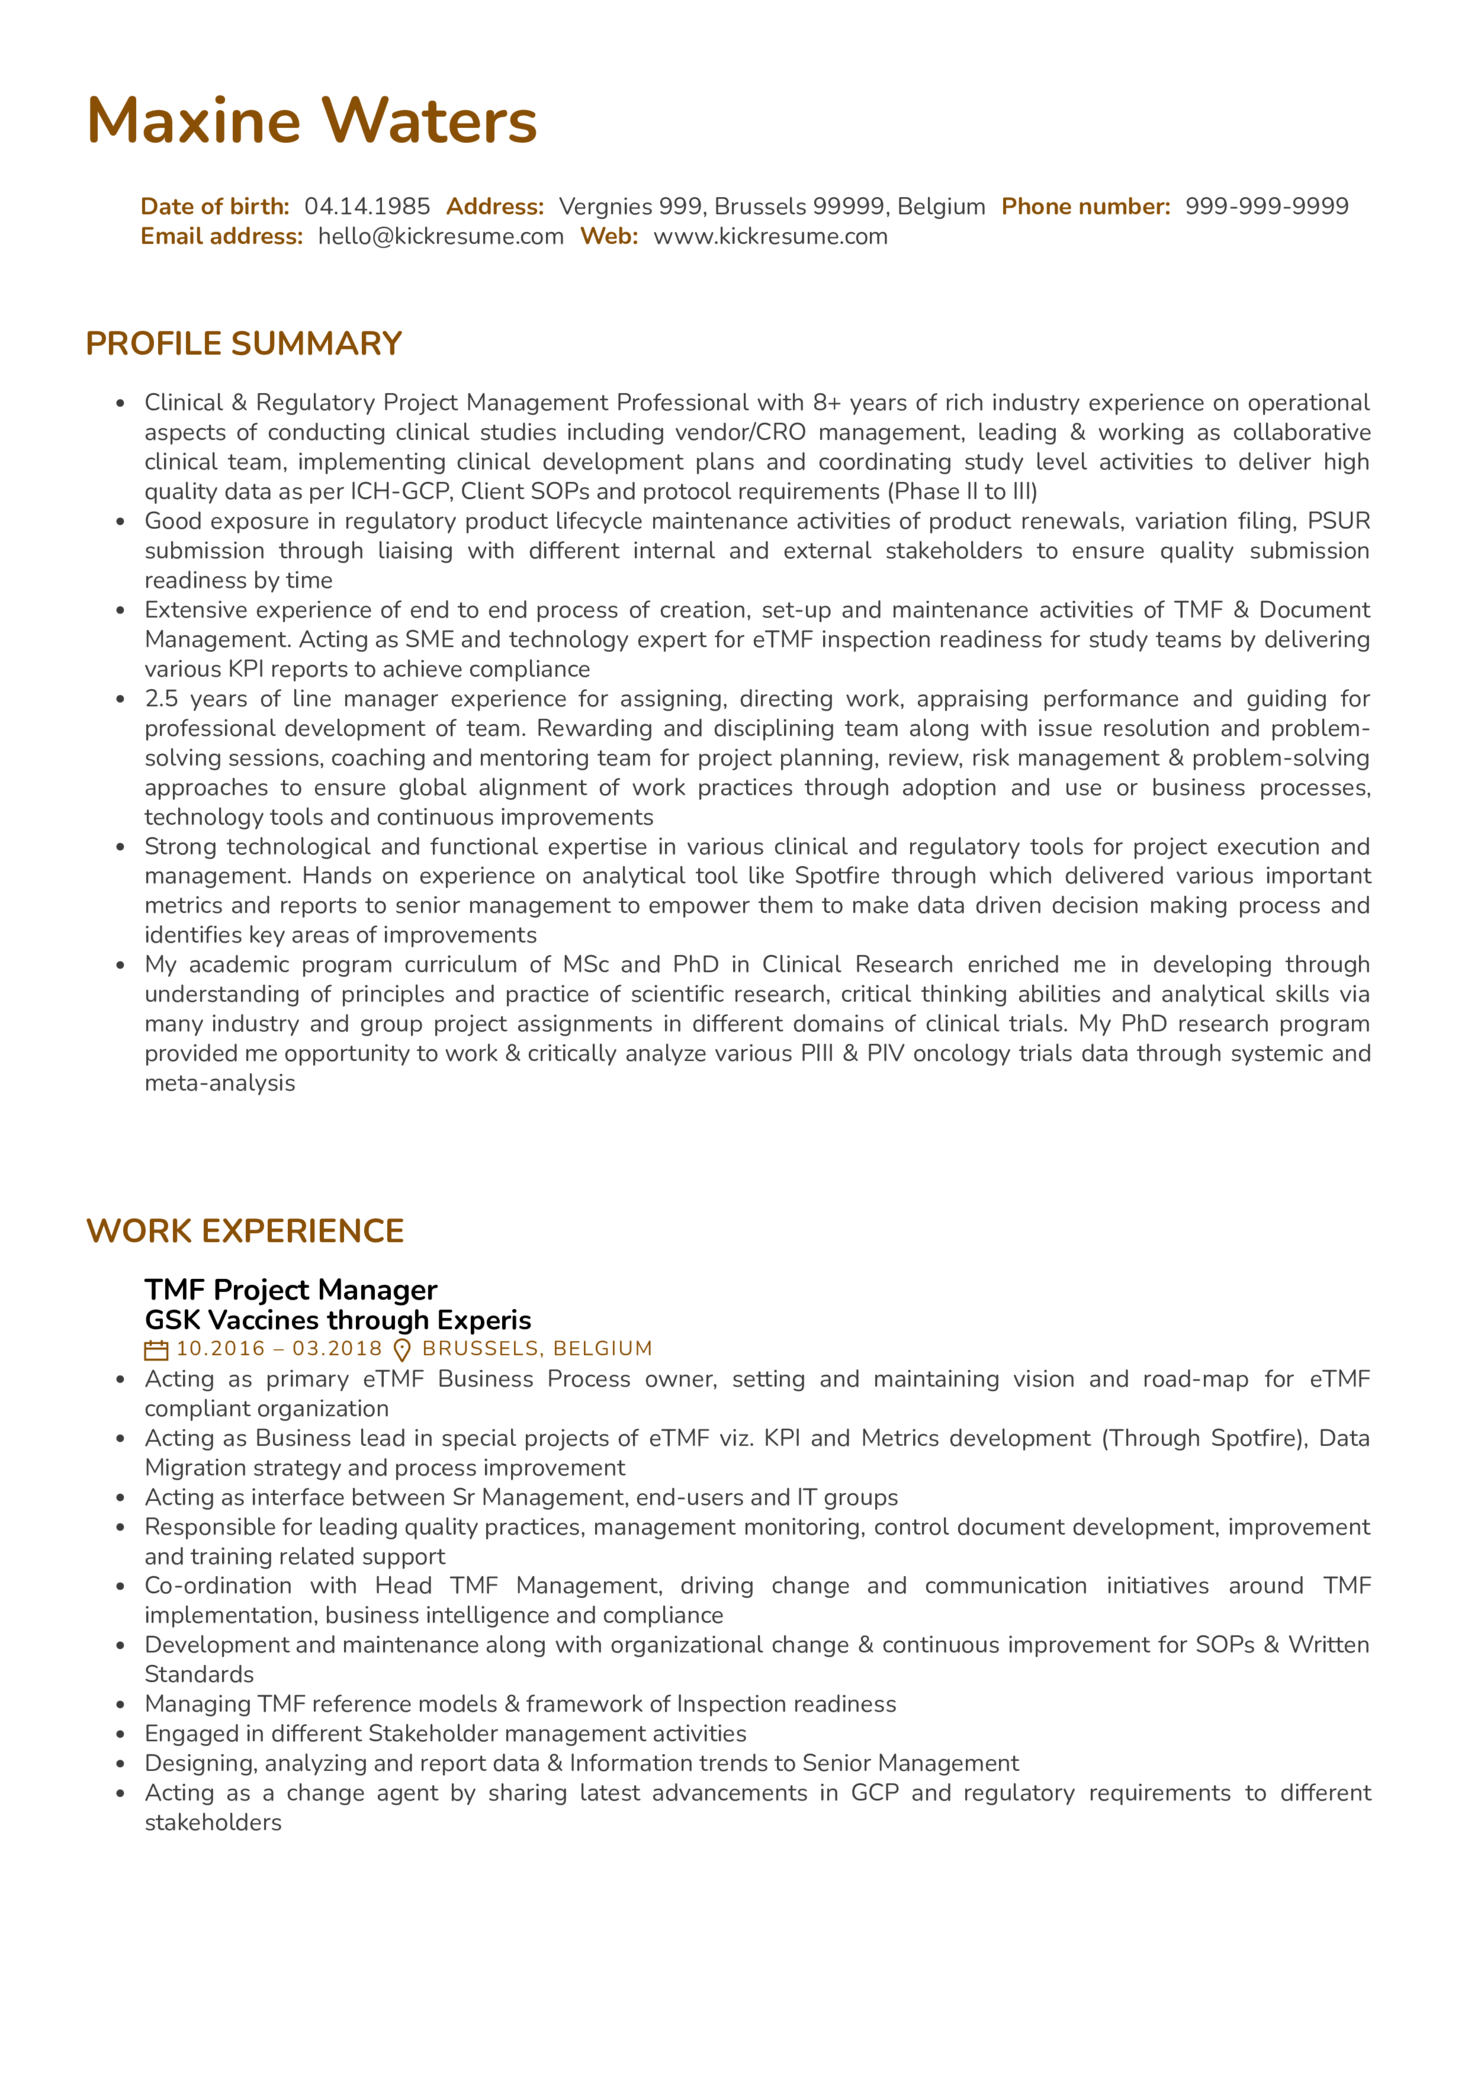 GlaxoSmithKline Manager Resume Example (parte 1)